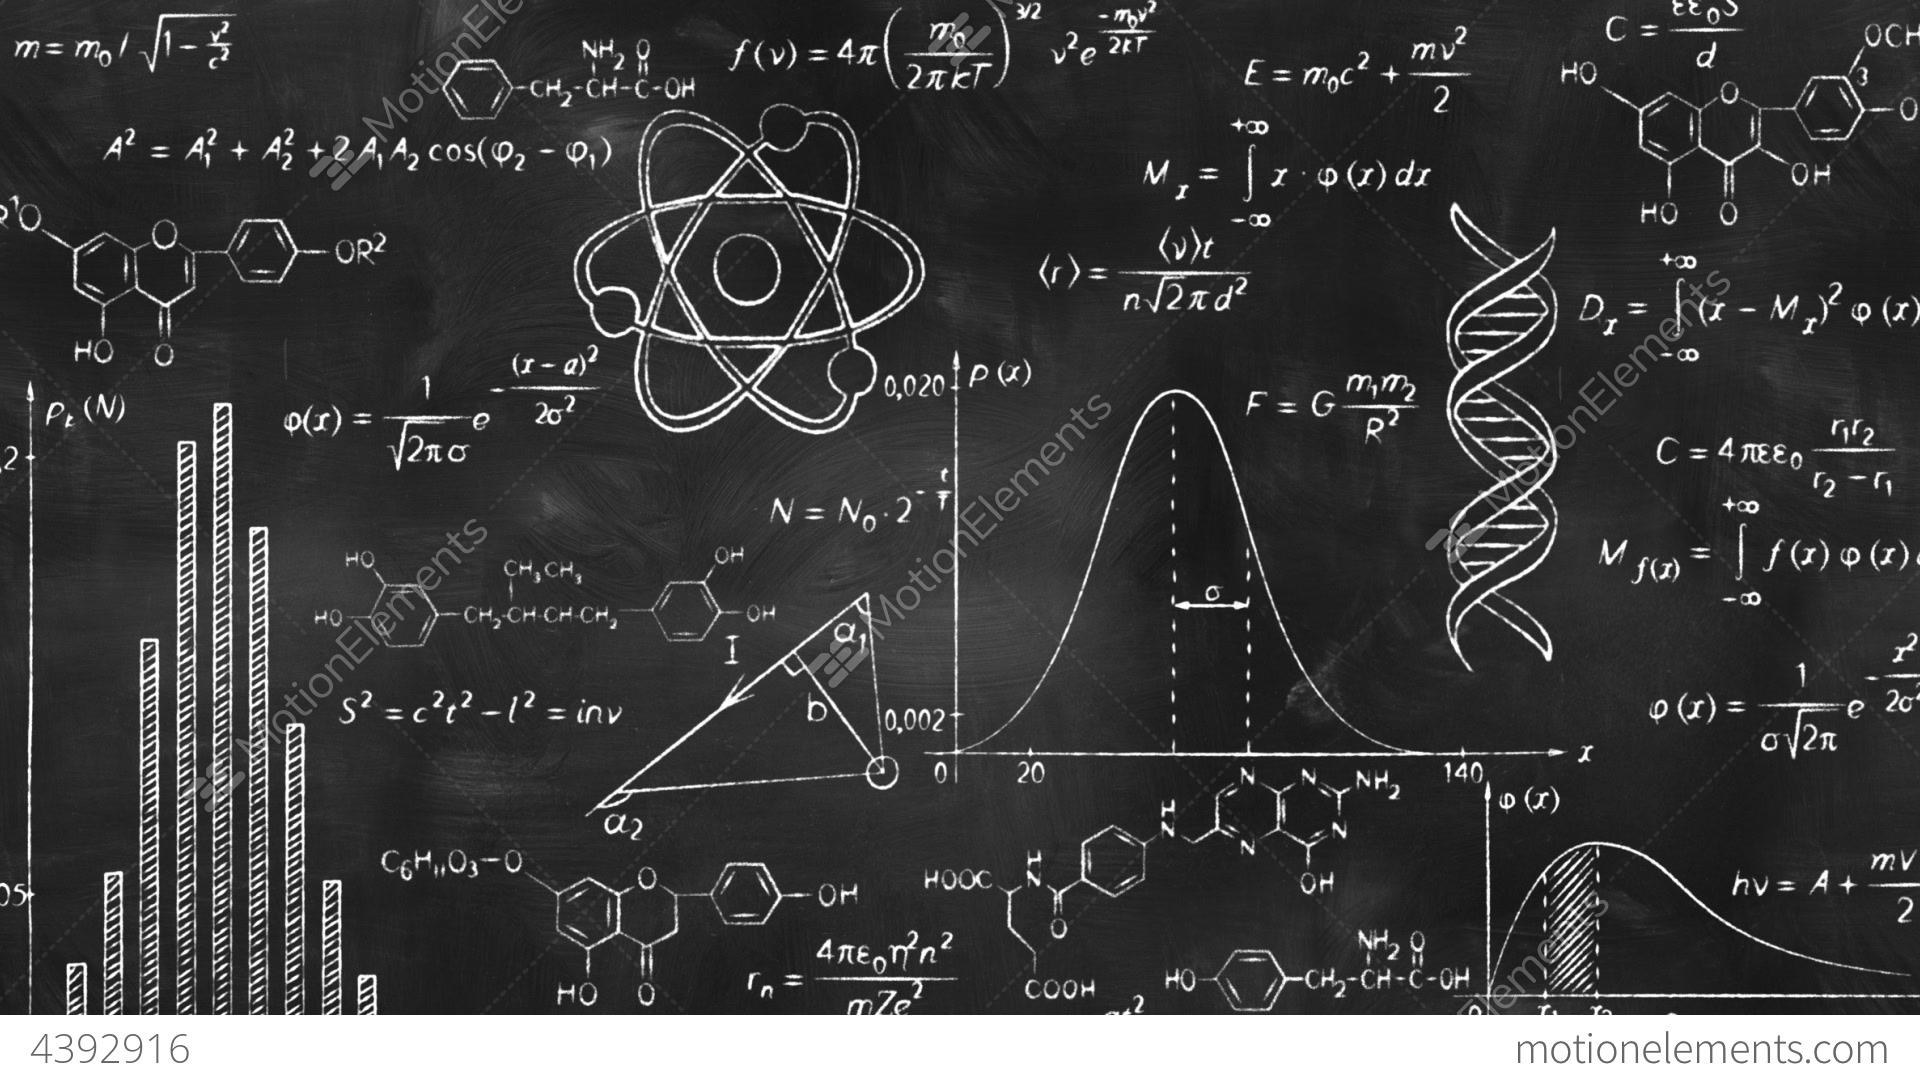 Free House Plan Software Writing Scientific Formulas On Black Chalkboard Stock